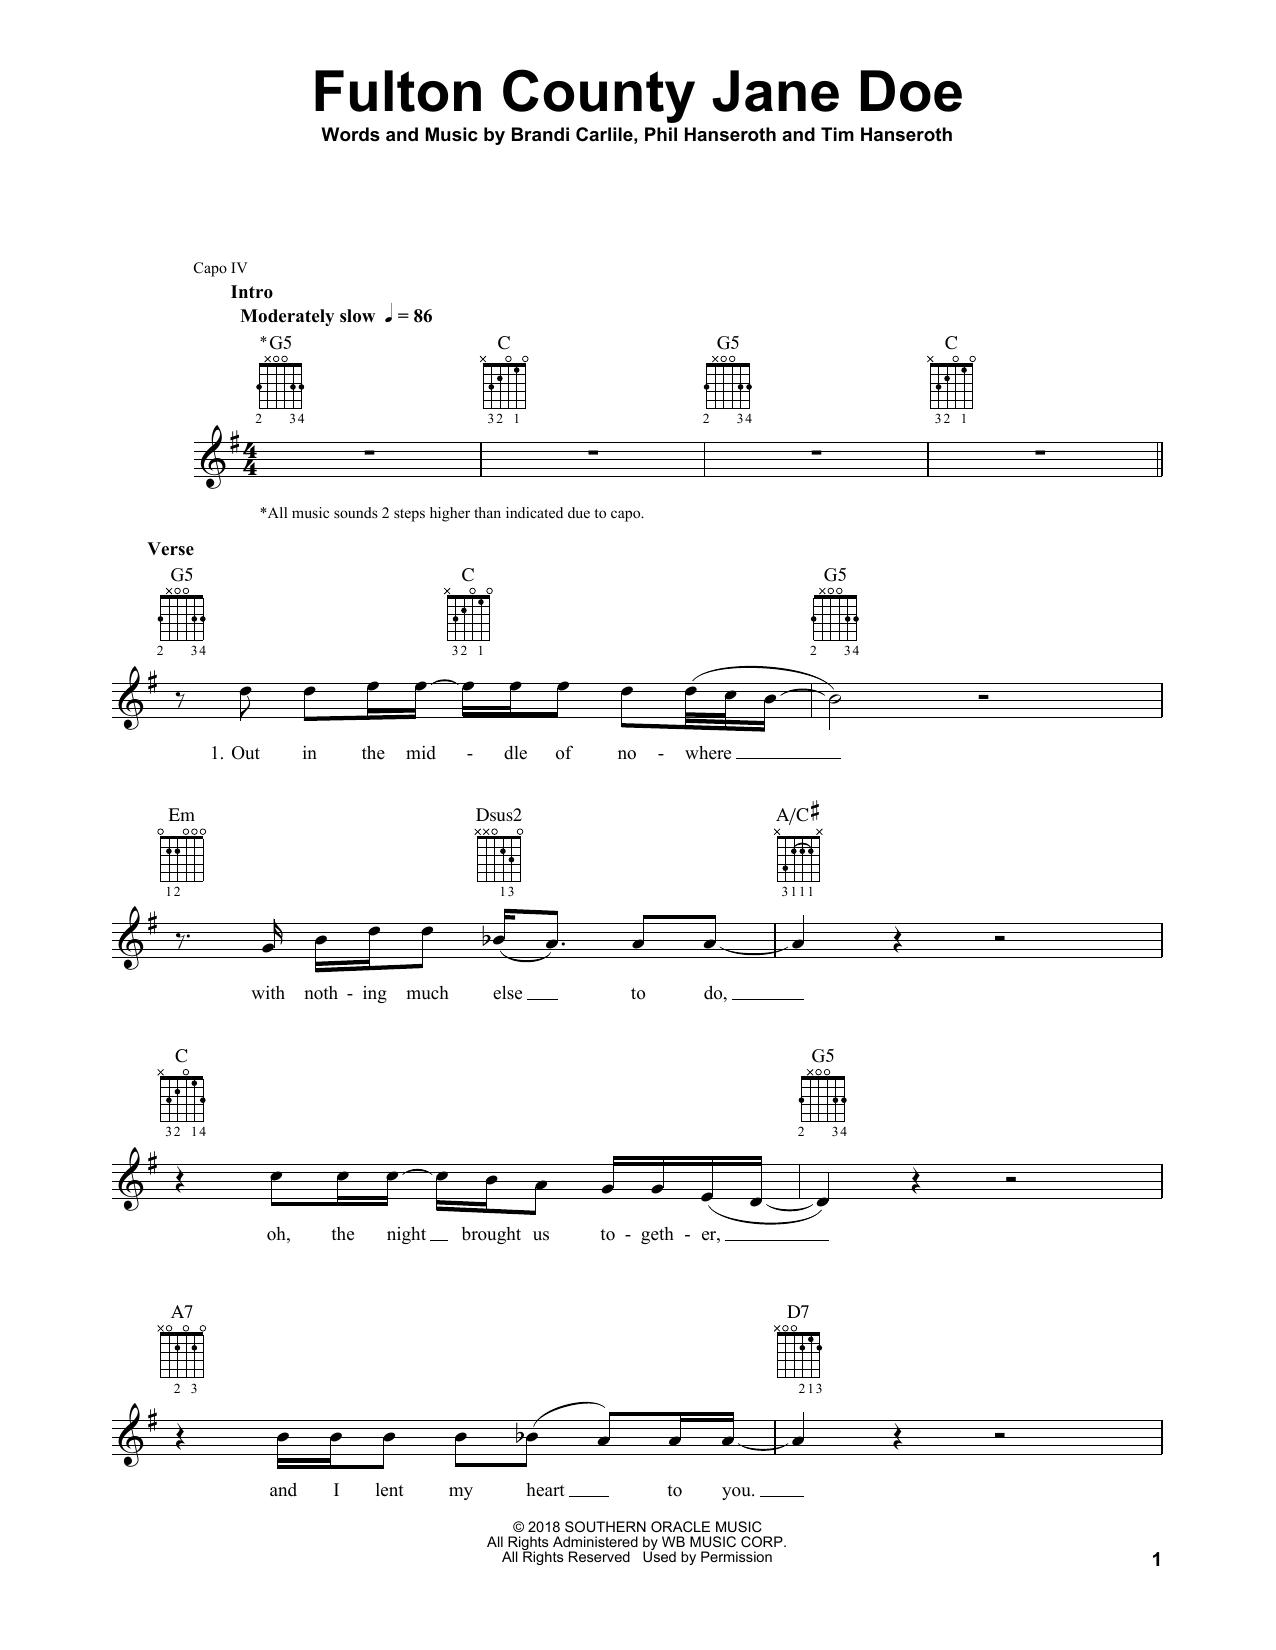 Fulton County Jane Doe Sheet Music